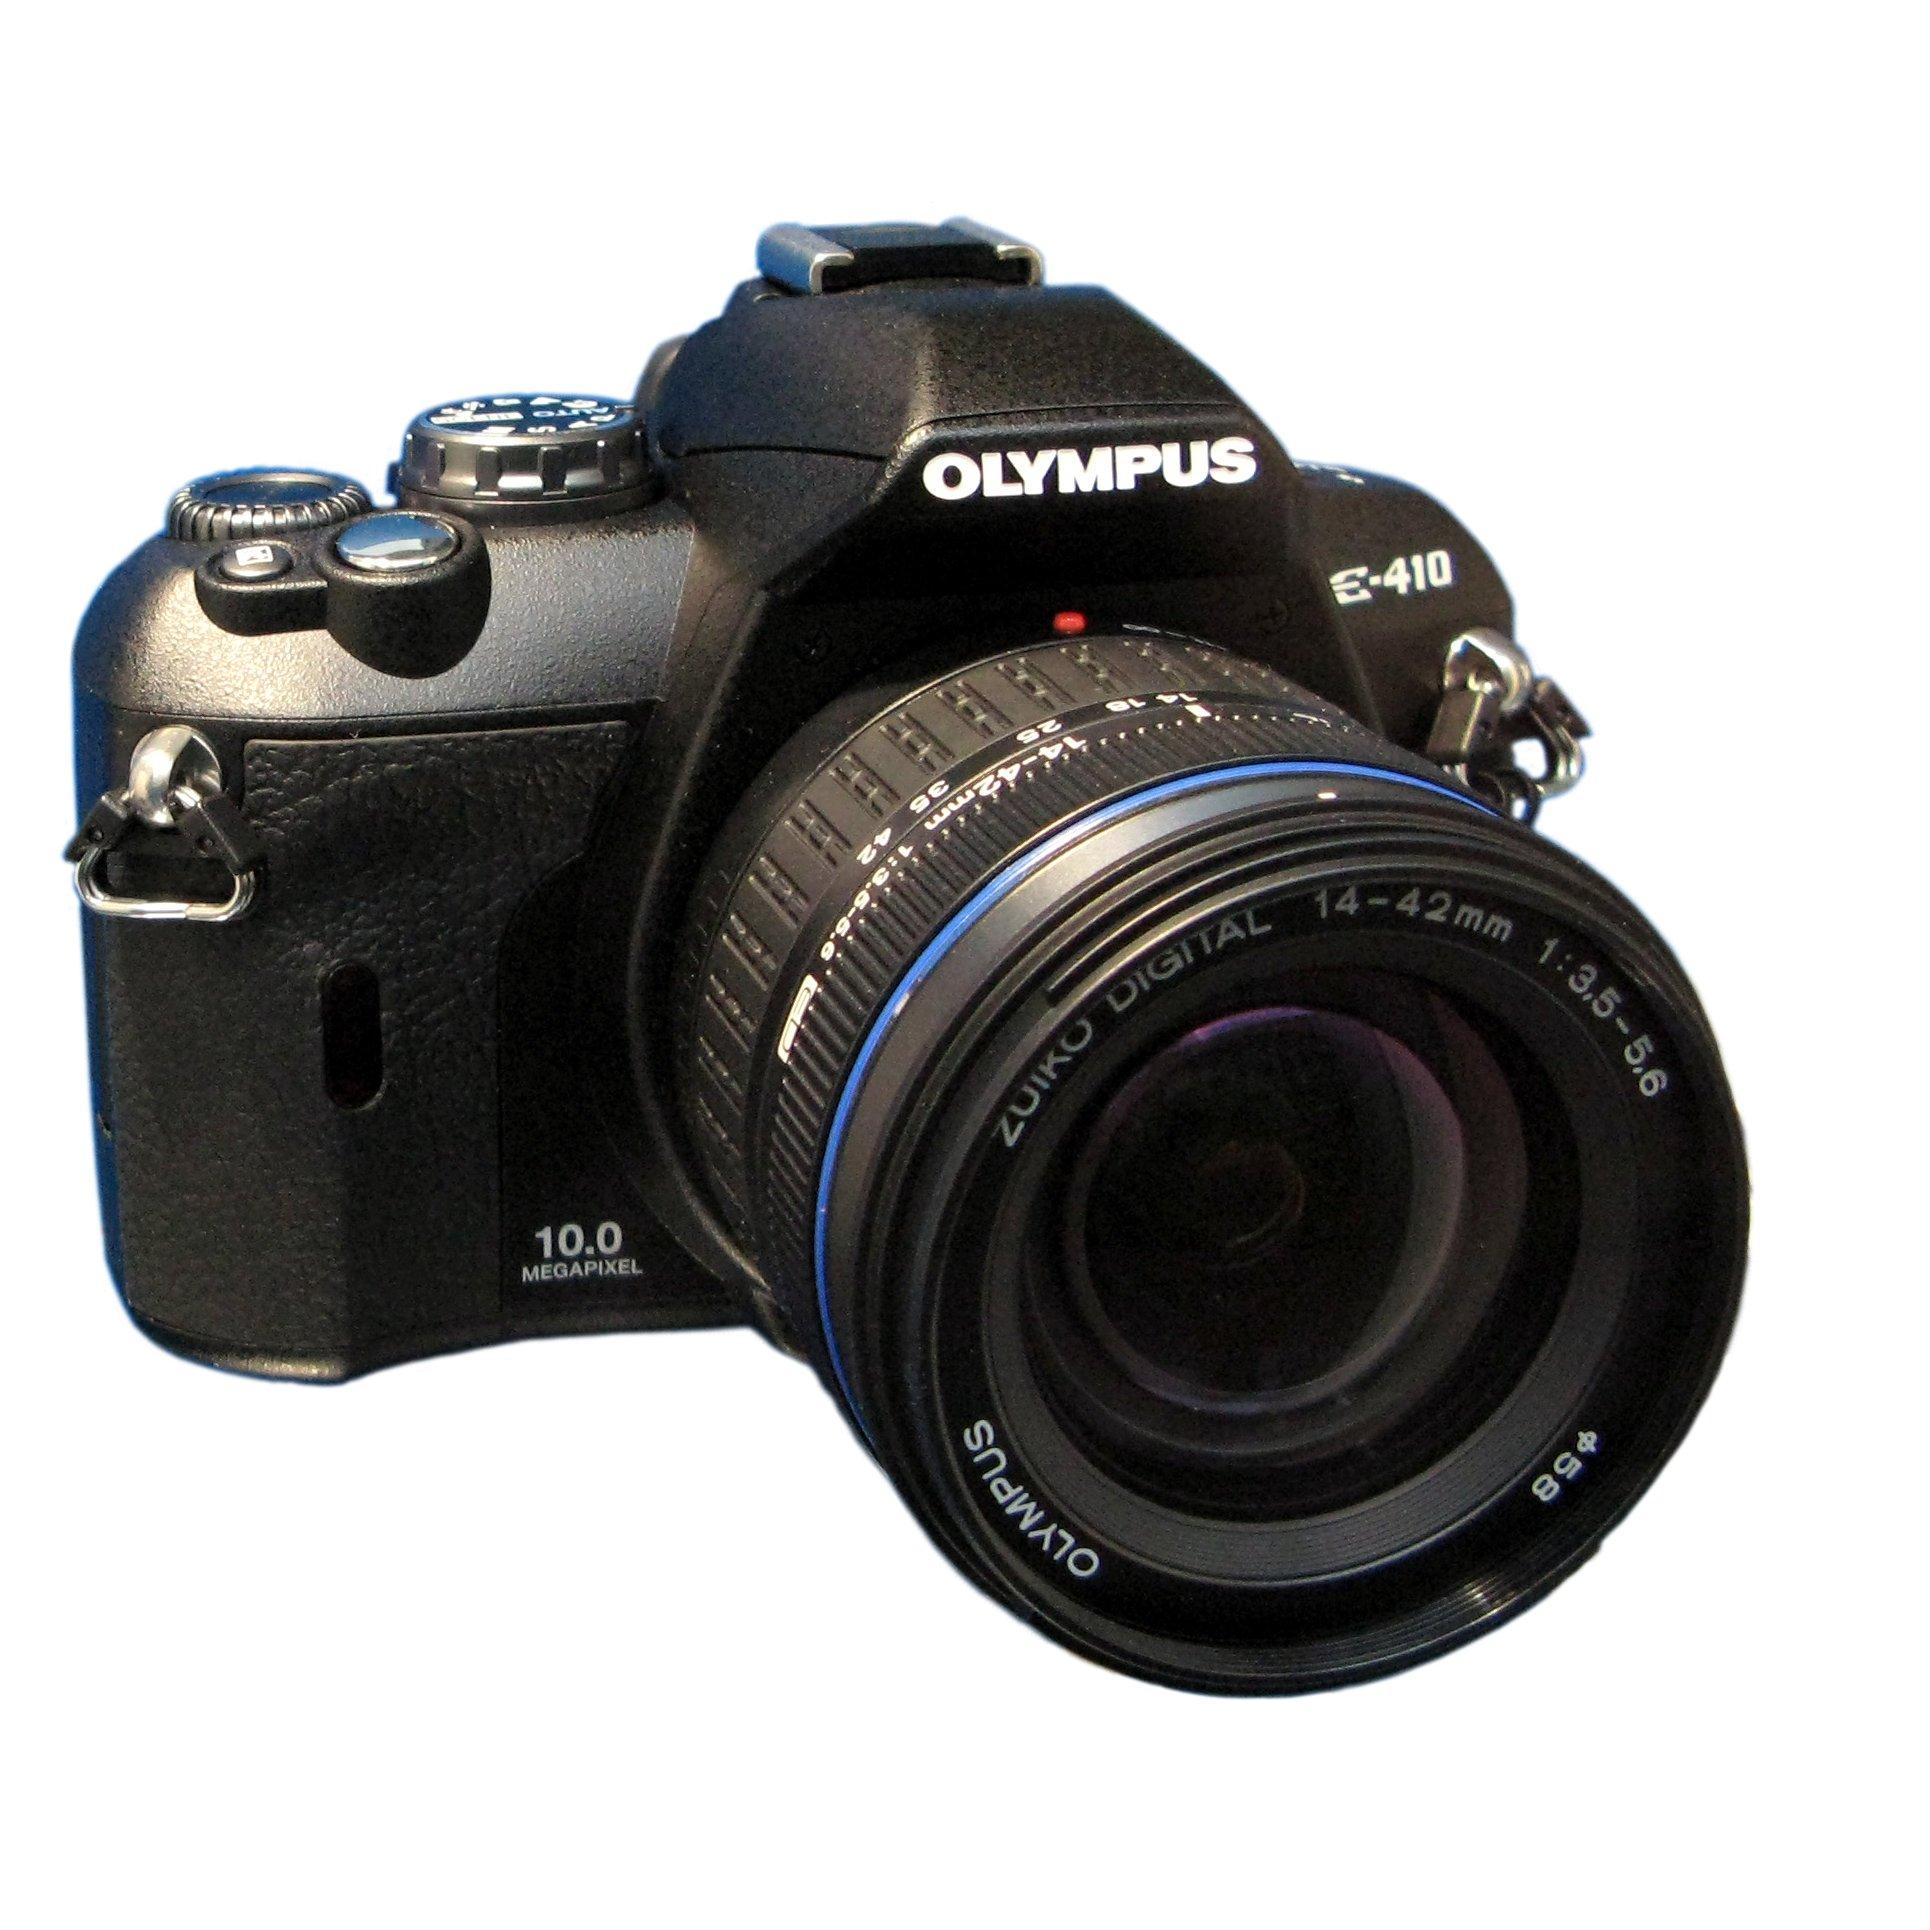 File Olympus E410 img ...